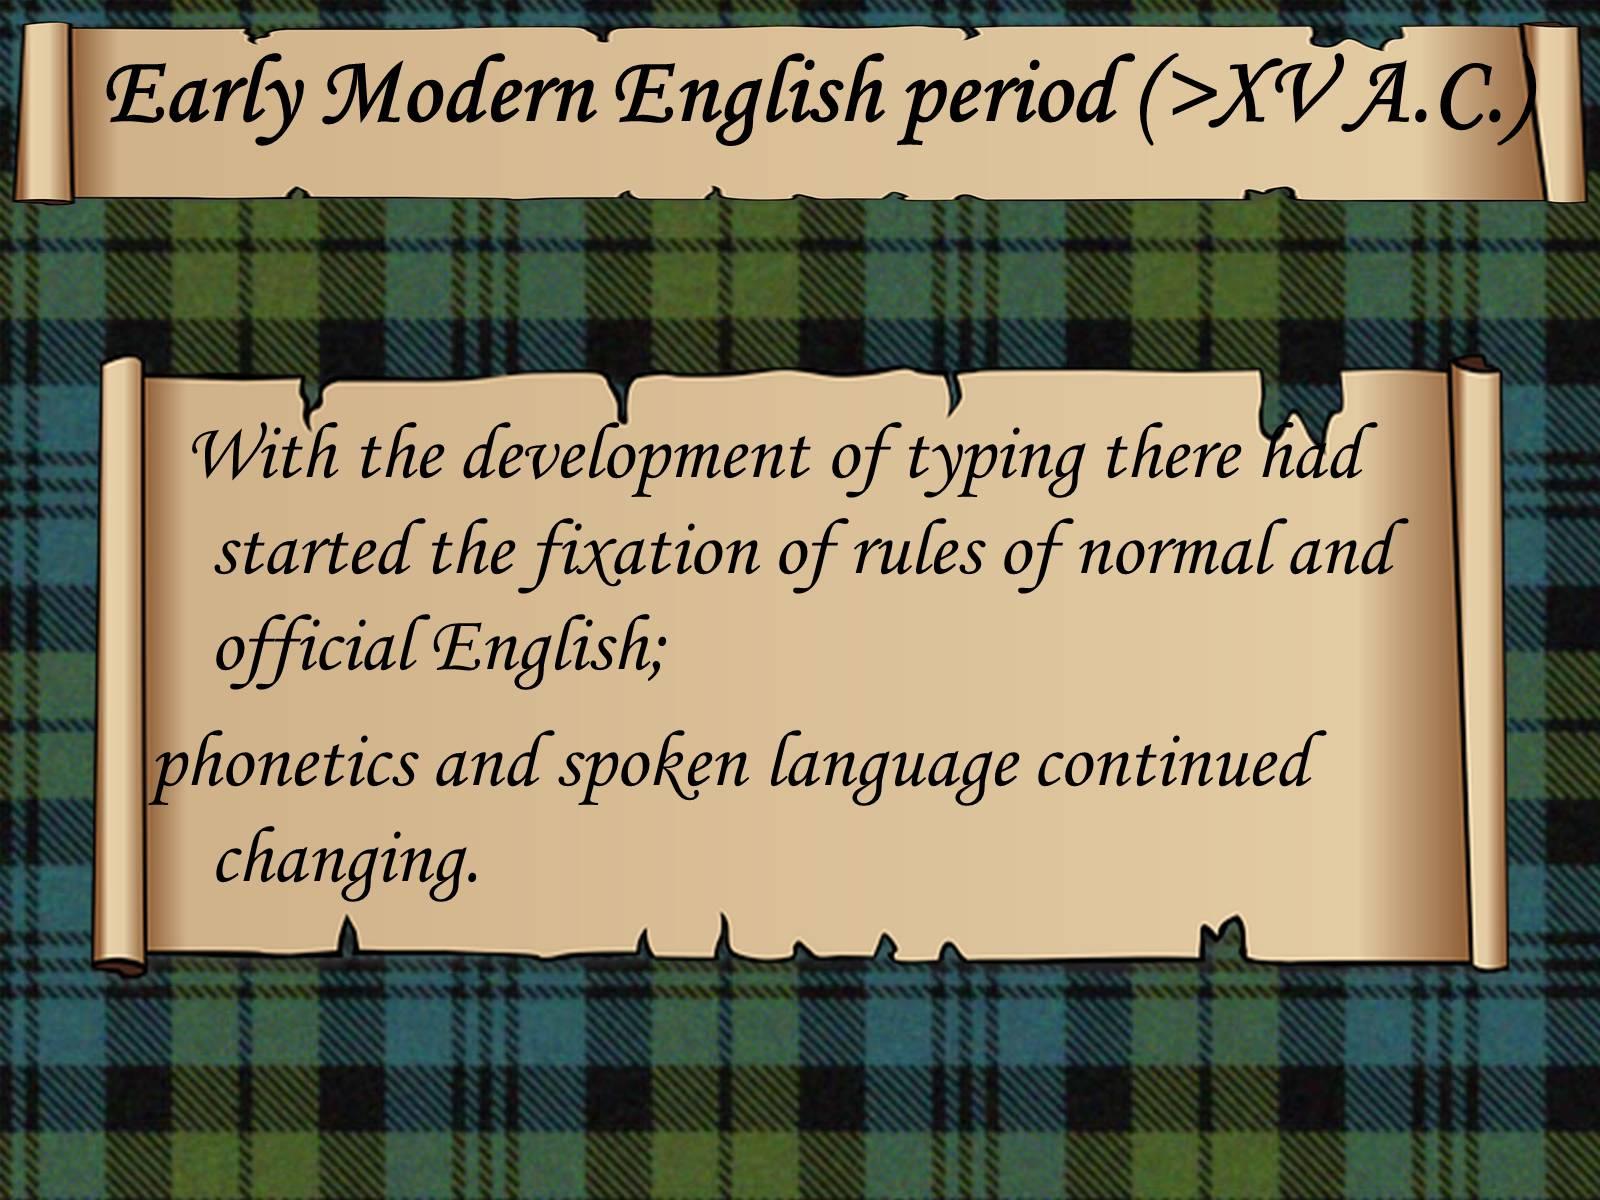 early modern english English language series on the english language: topics english language english-speaking world english as a second language history of english high level topics.